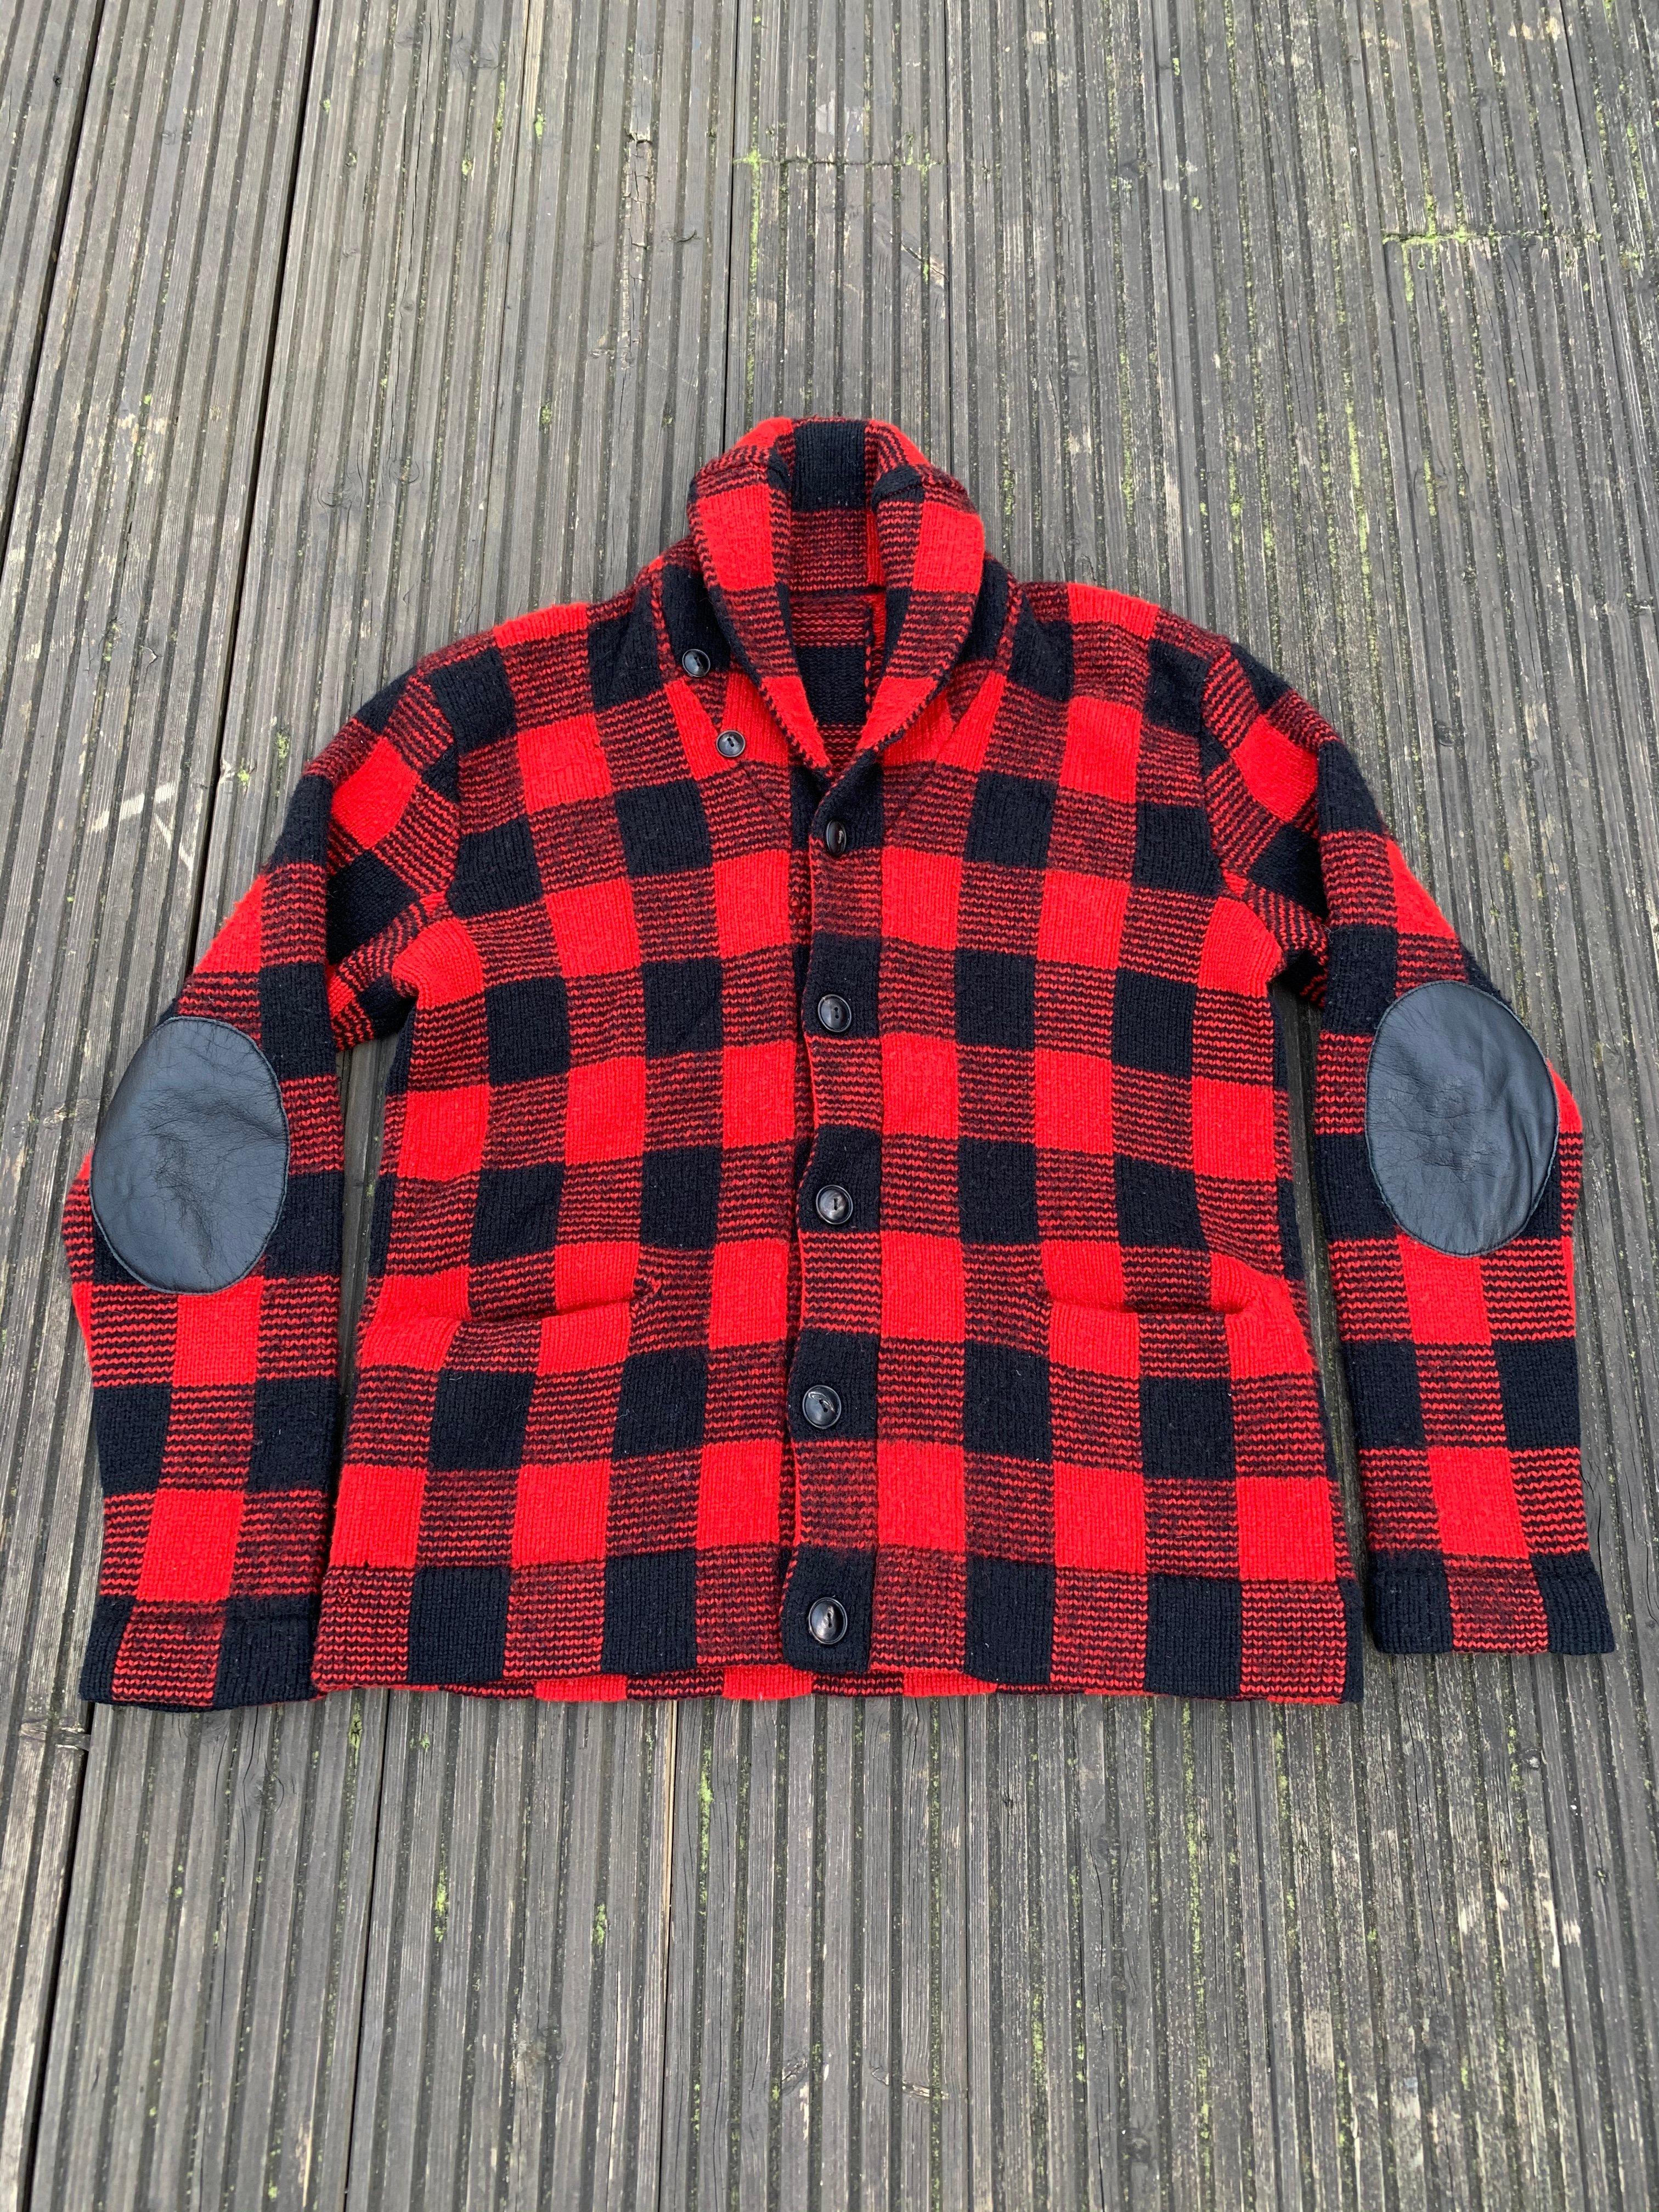 Image of Old wool shawl collar cardigan